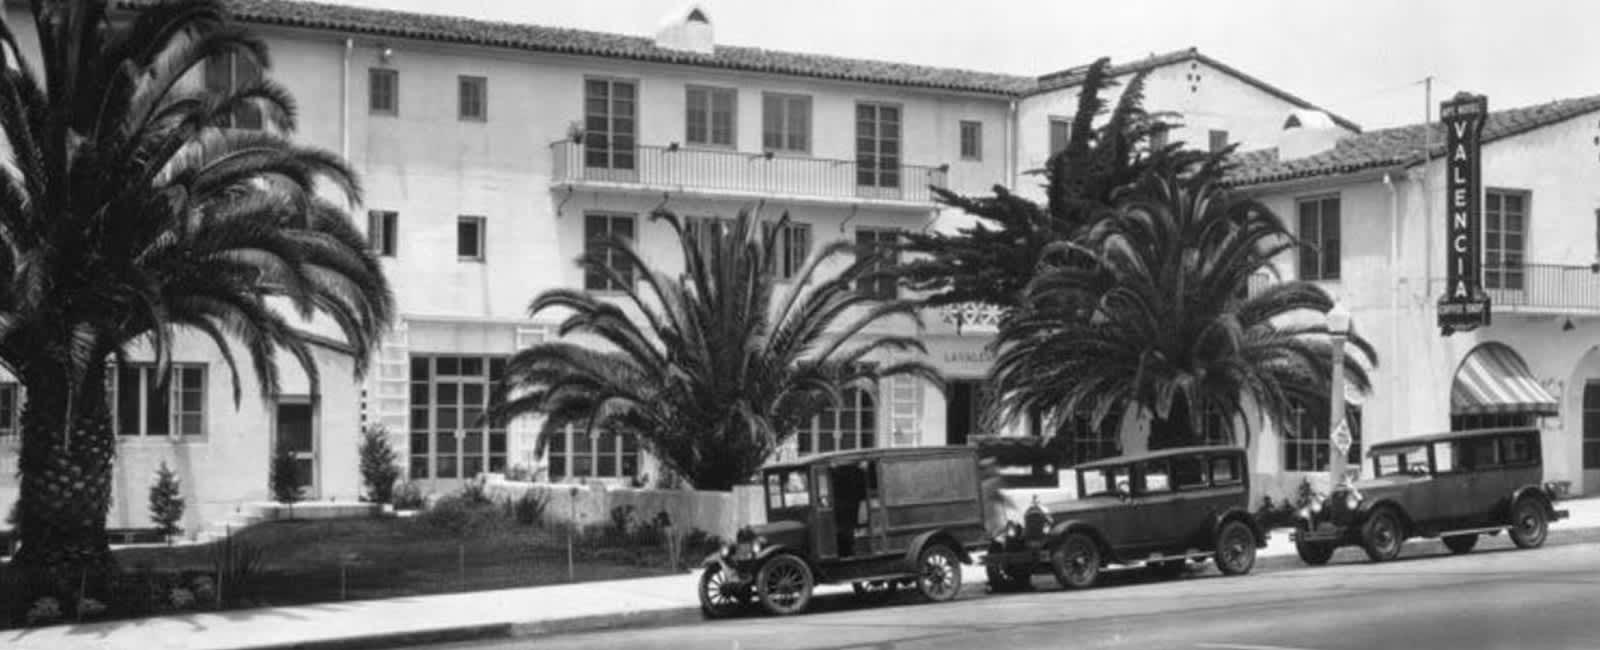 History of La Valencia Hotel California